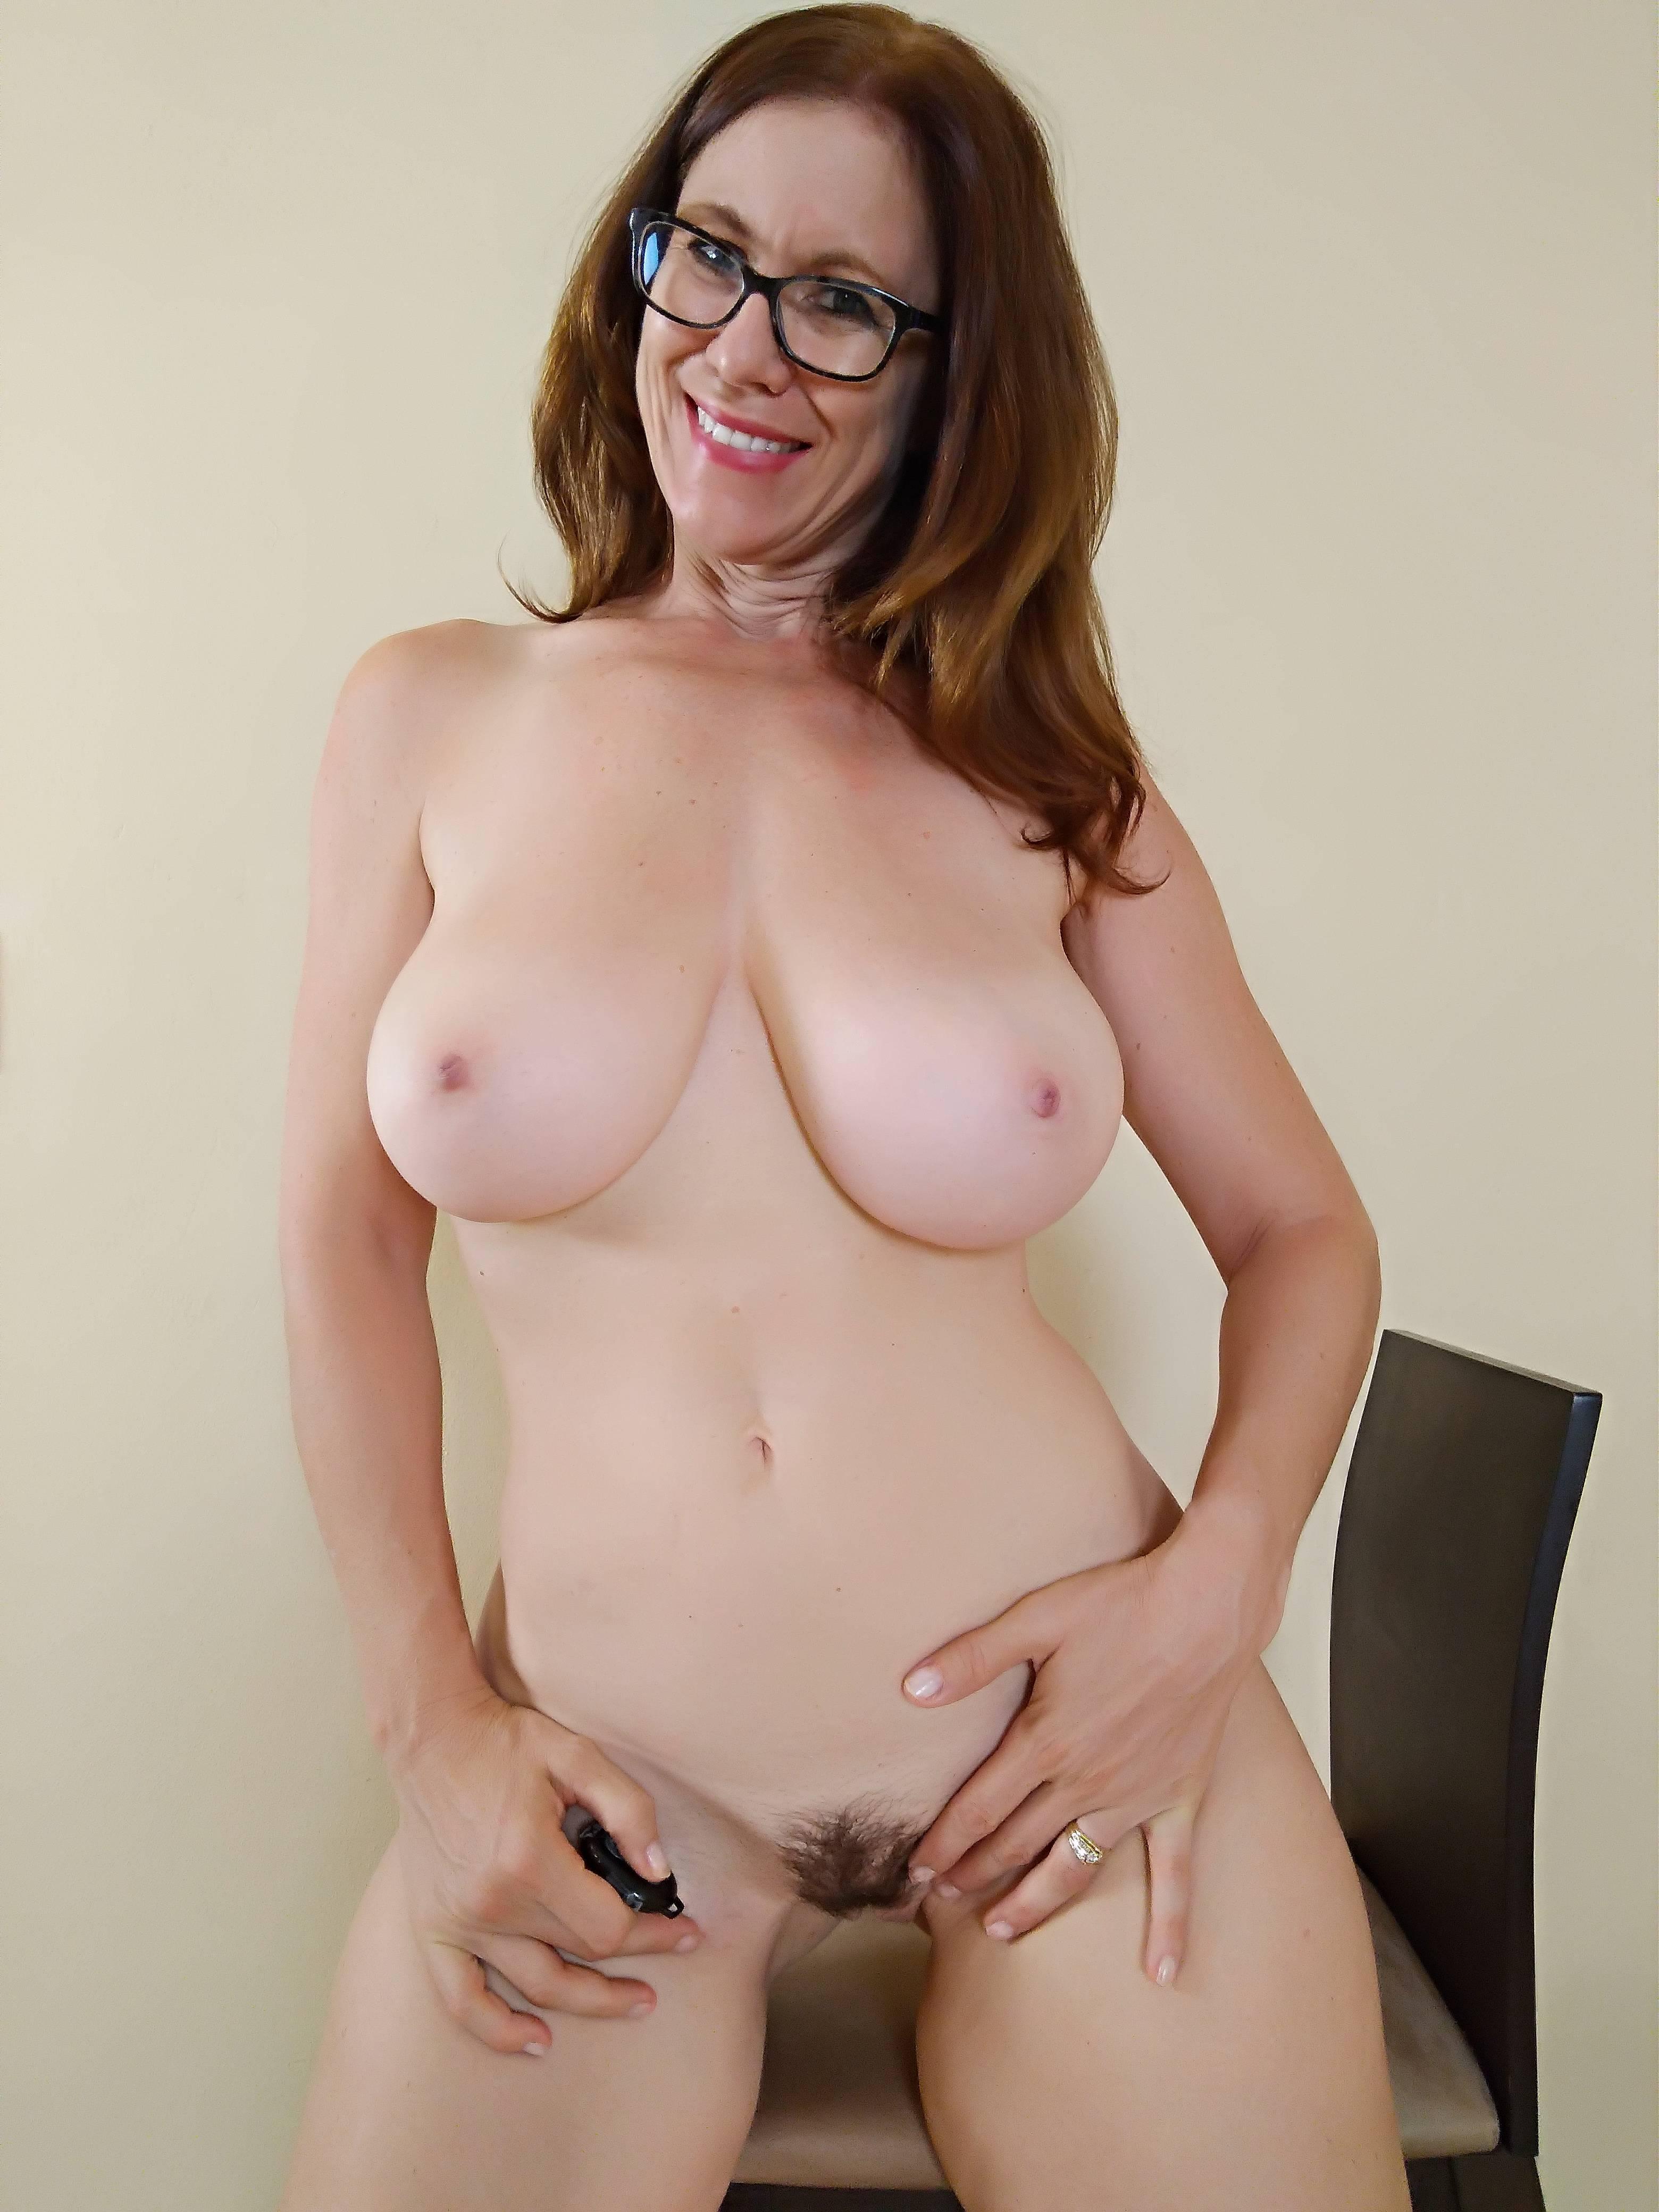 Moms naked pics